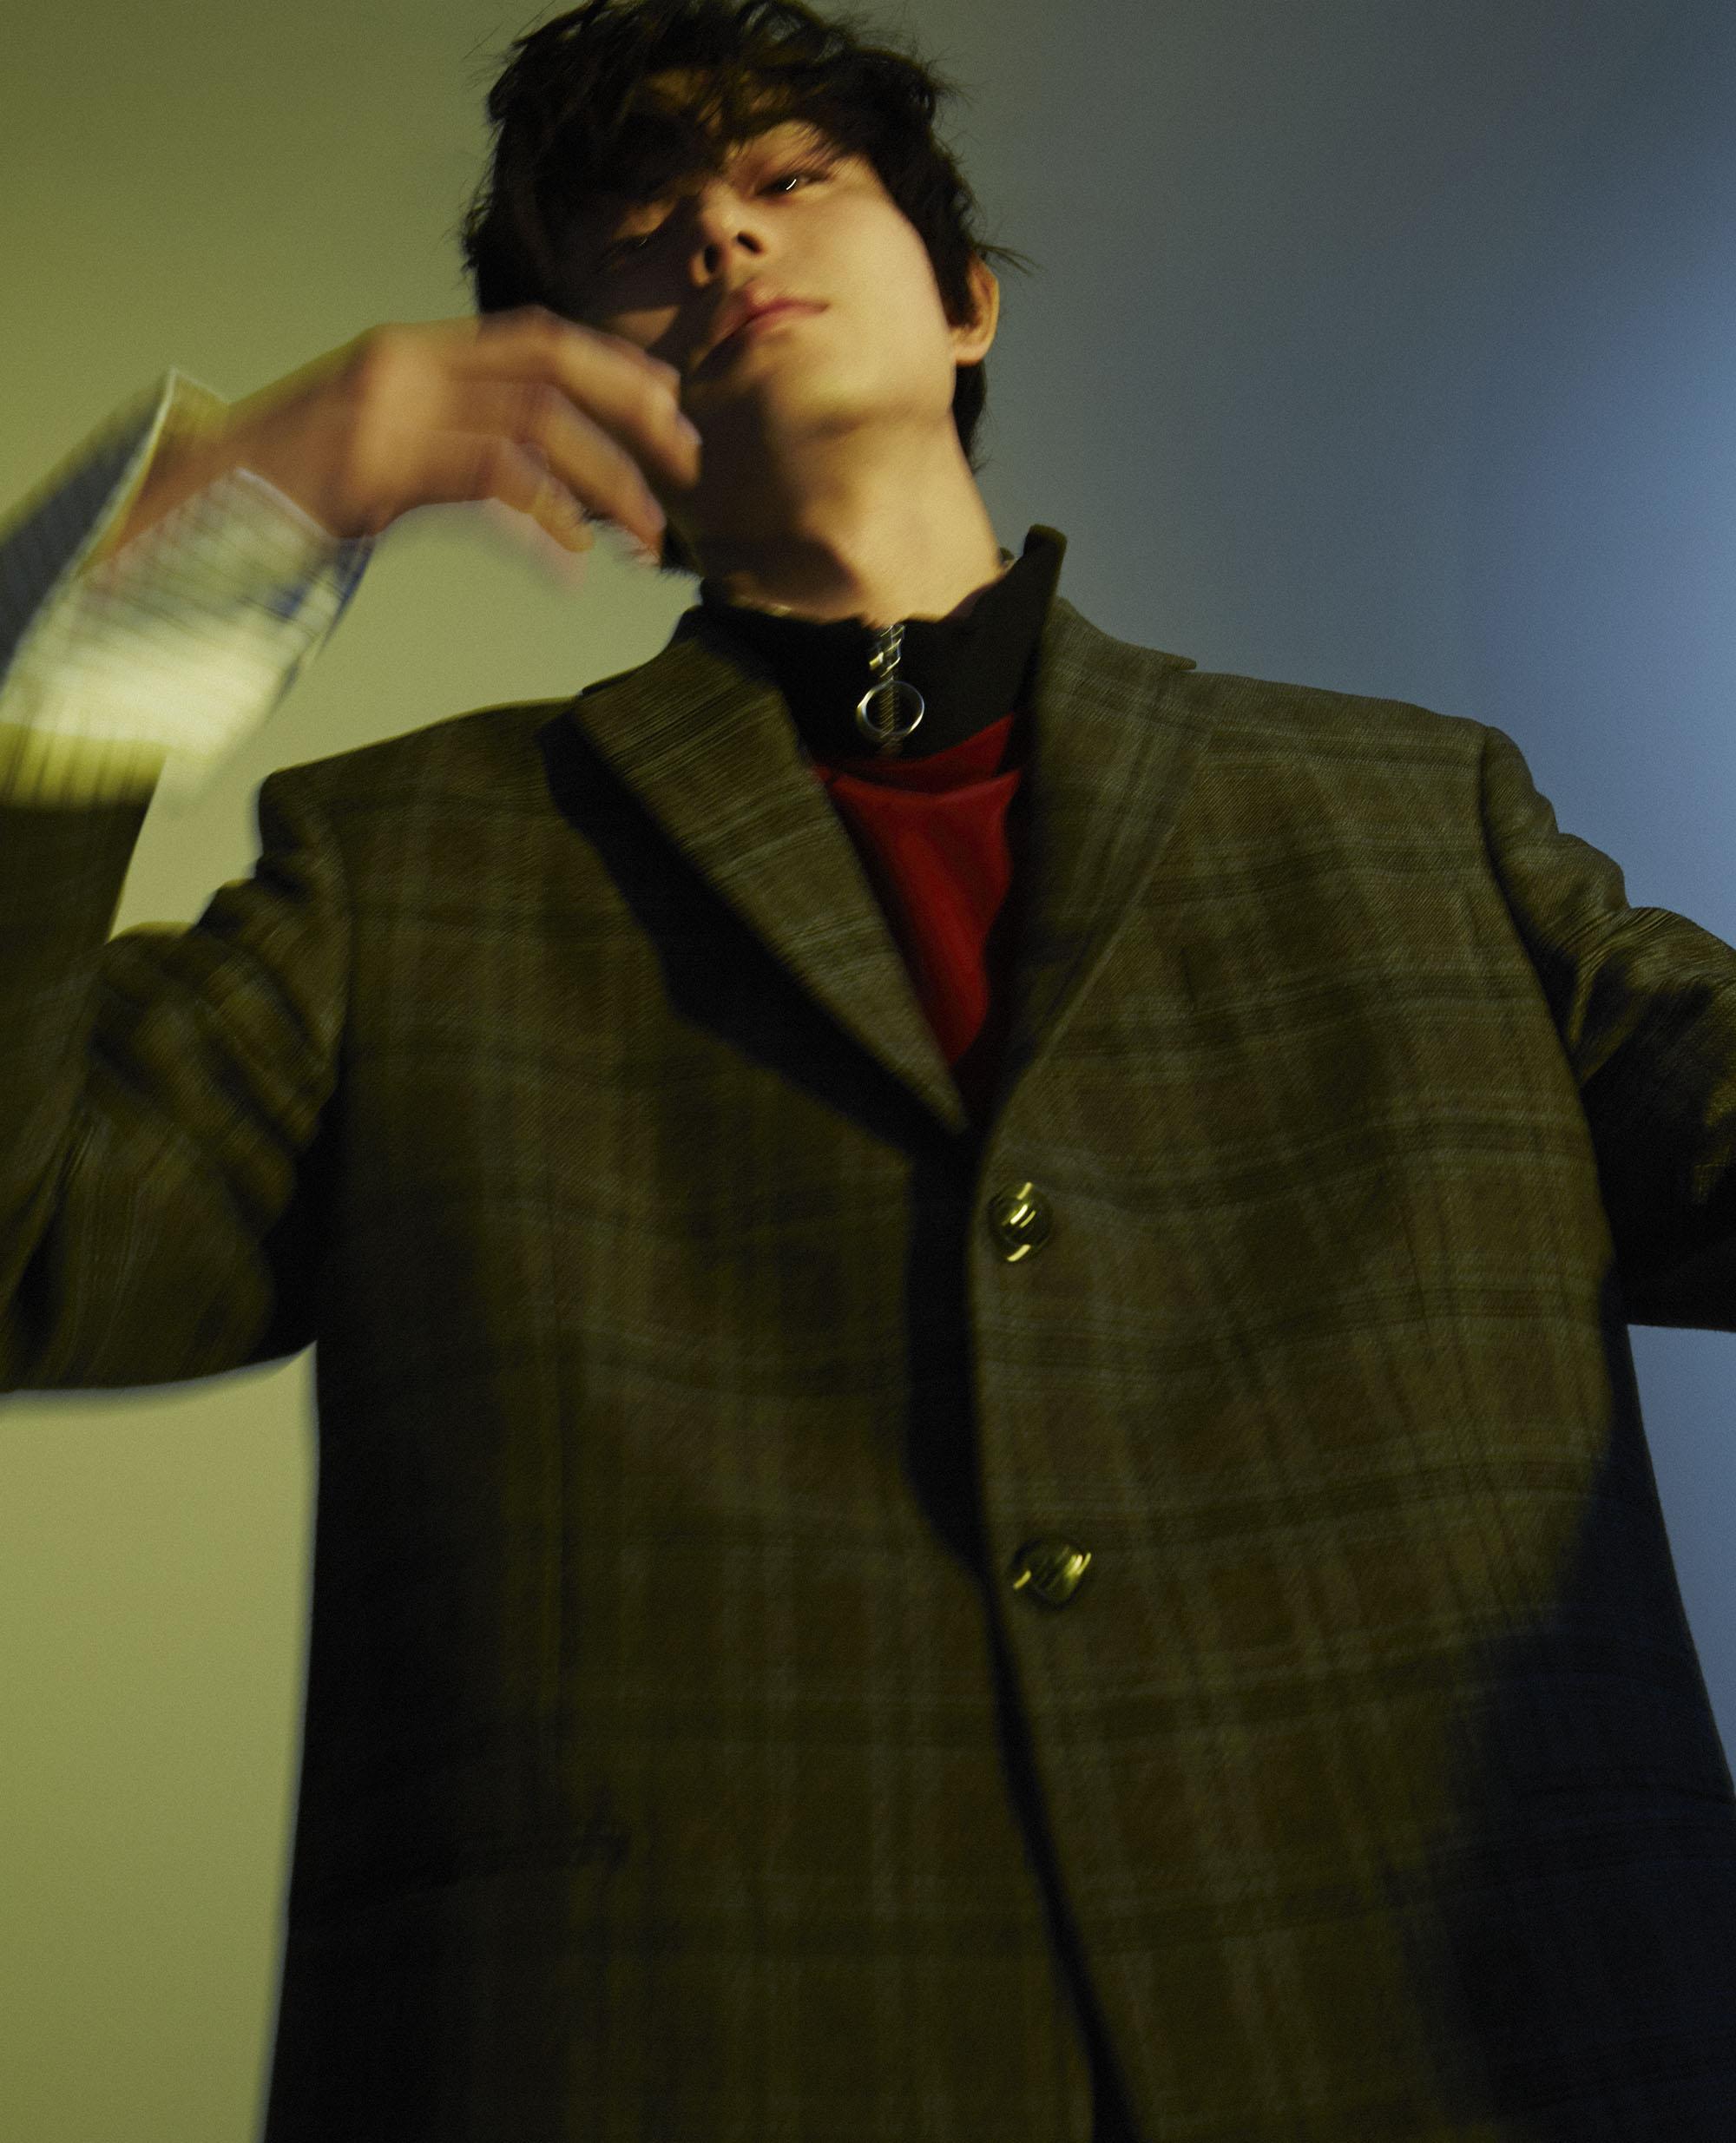 <Masaki Suda wears>ウェールズチェック ジャケット/Vetements、ストライプシャツ/CHIN MENS、以上スタイリスト私物、ジップ ディティール トップス ¥ 24,000/comme je suis (comme je suis)